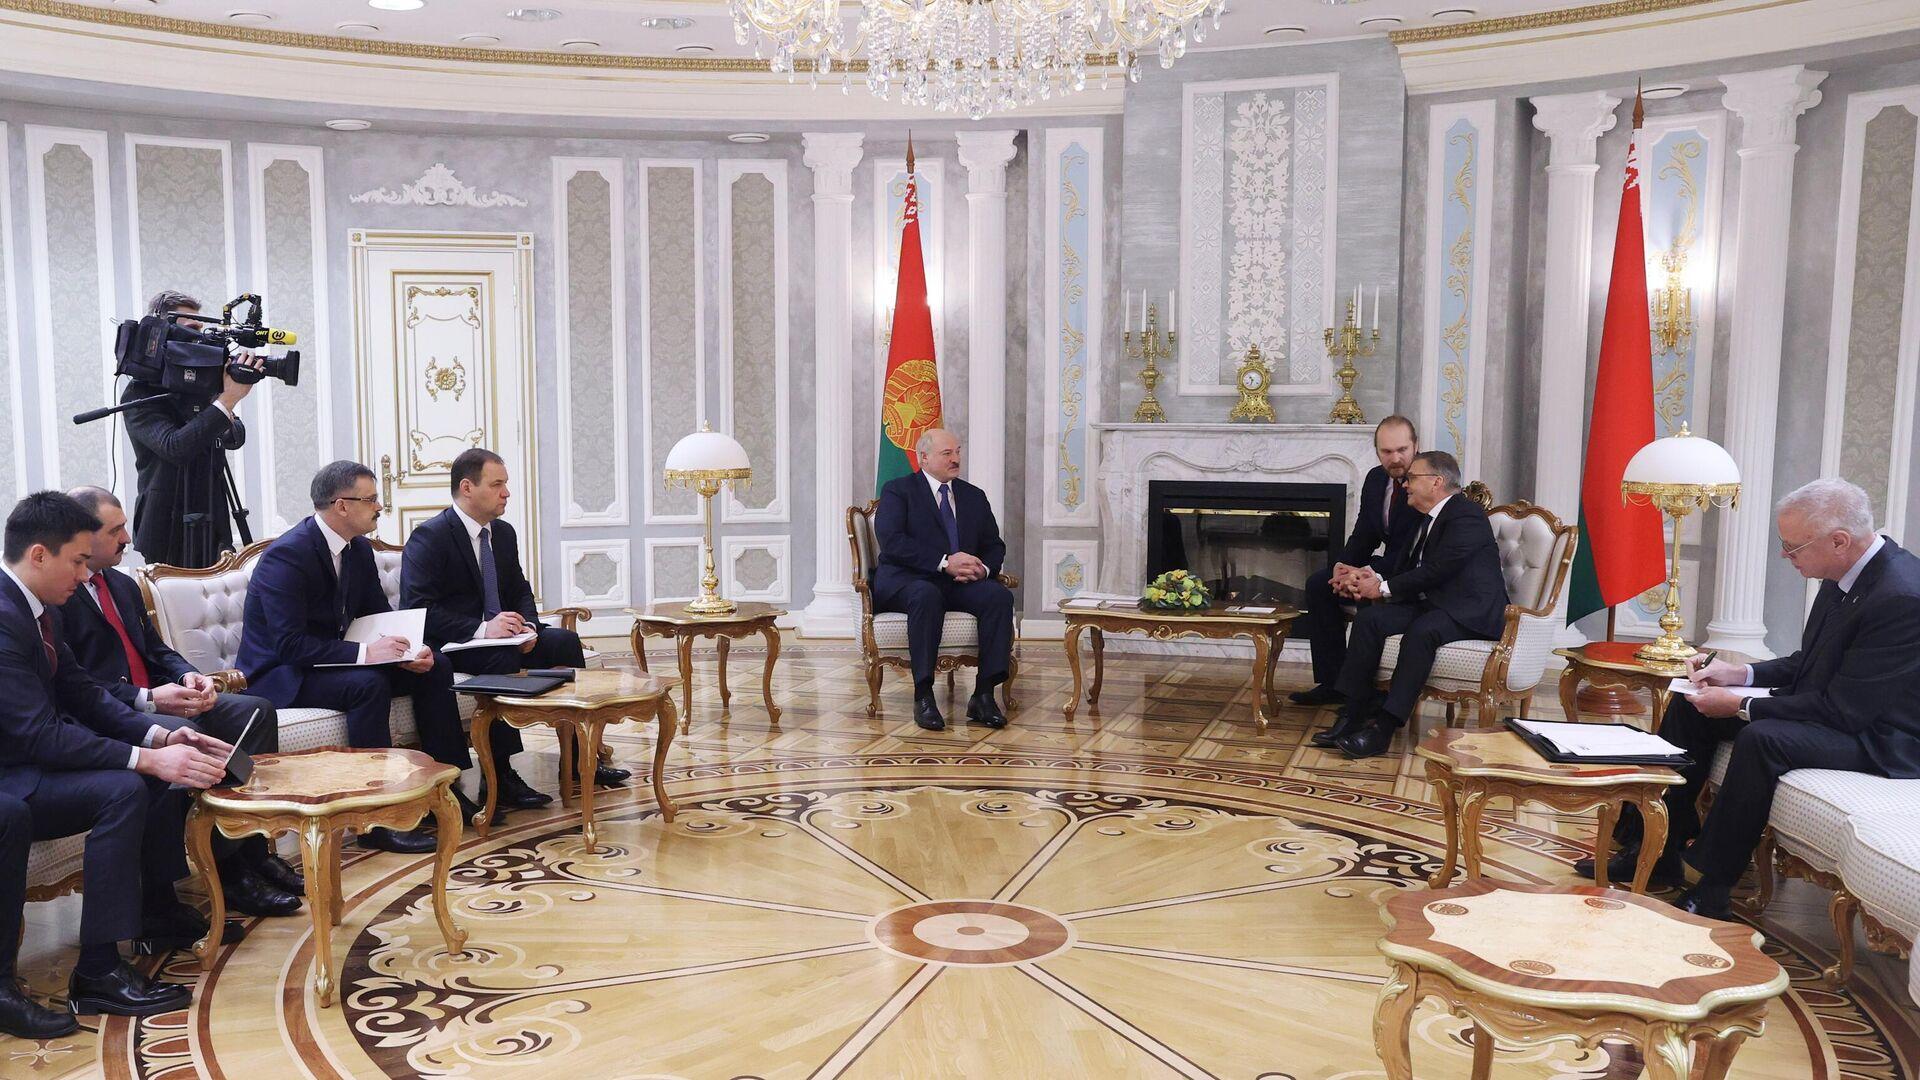 Александр Лукашенко (в центре слева) и Рене Фазель (в центре справа)  - РИА Новости, 1920, 11.01.2021